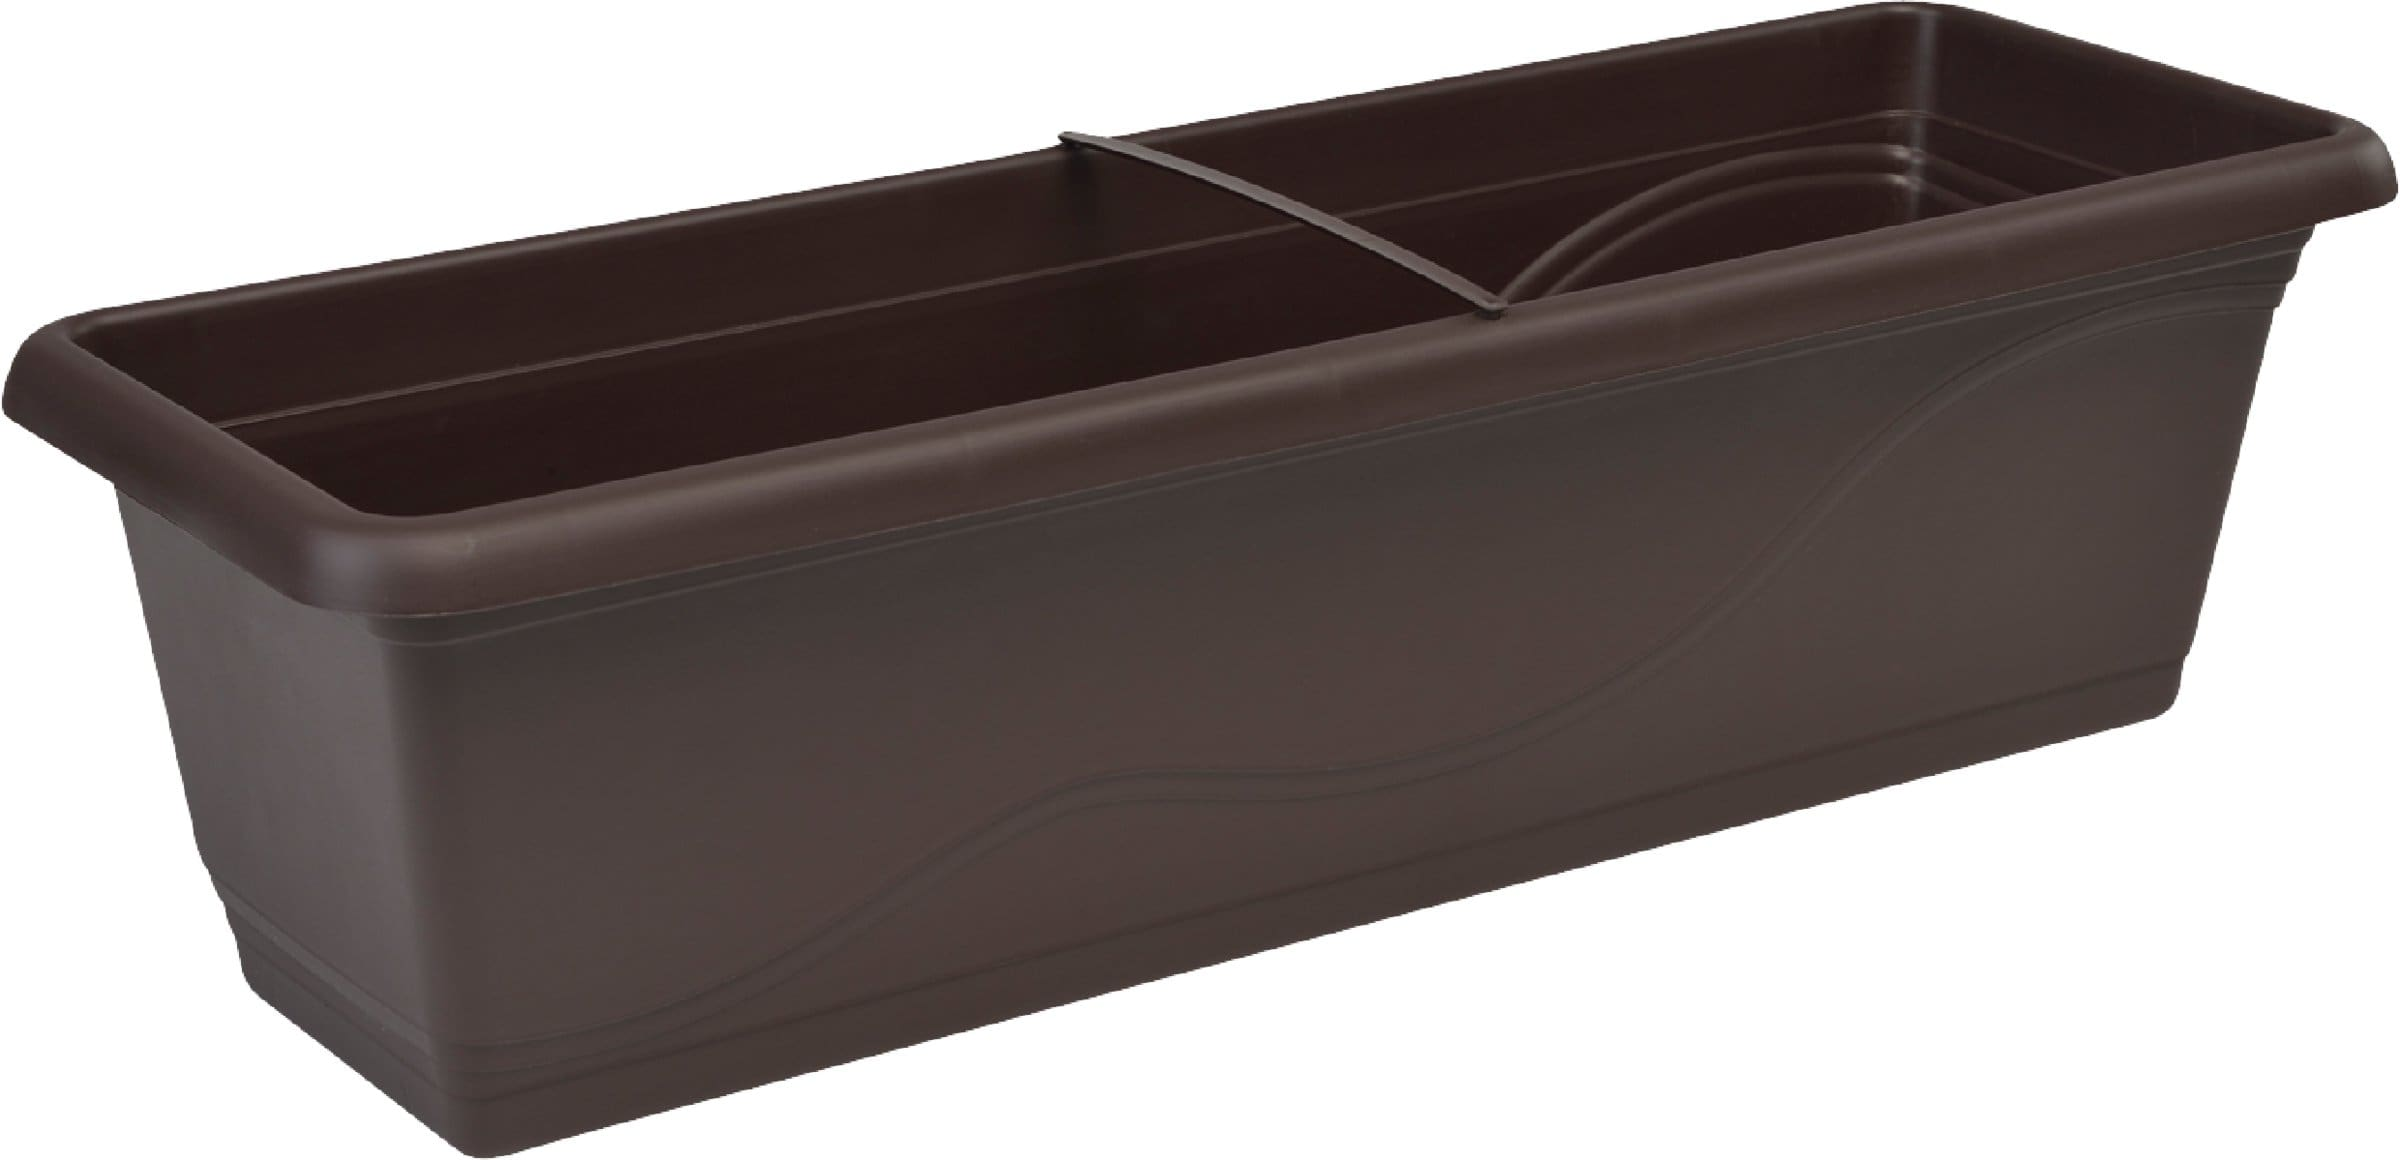 blumenkasten kunststoff migipedia. Black Bedroom Furniture Sets. Home Design Ideas